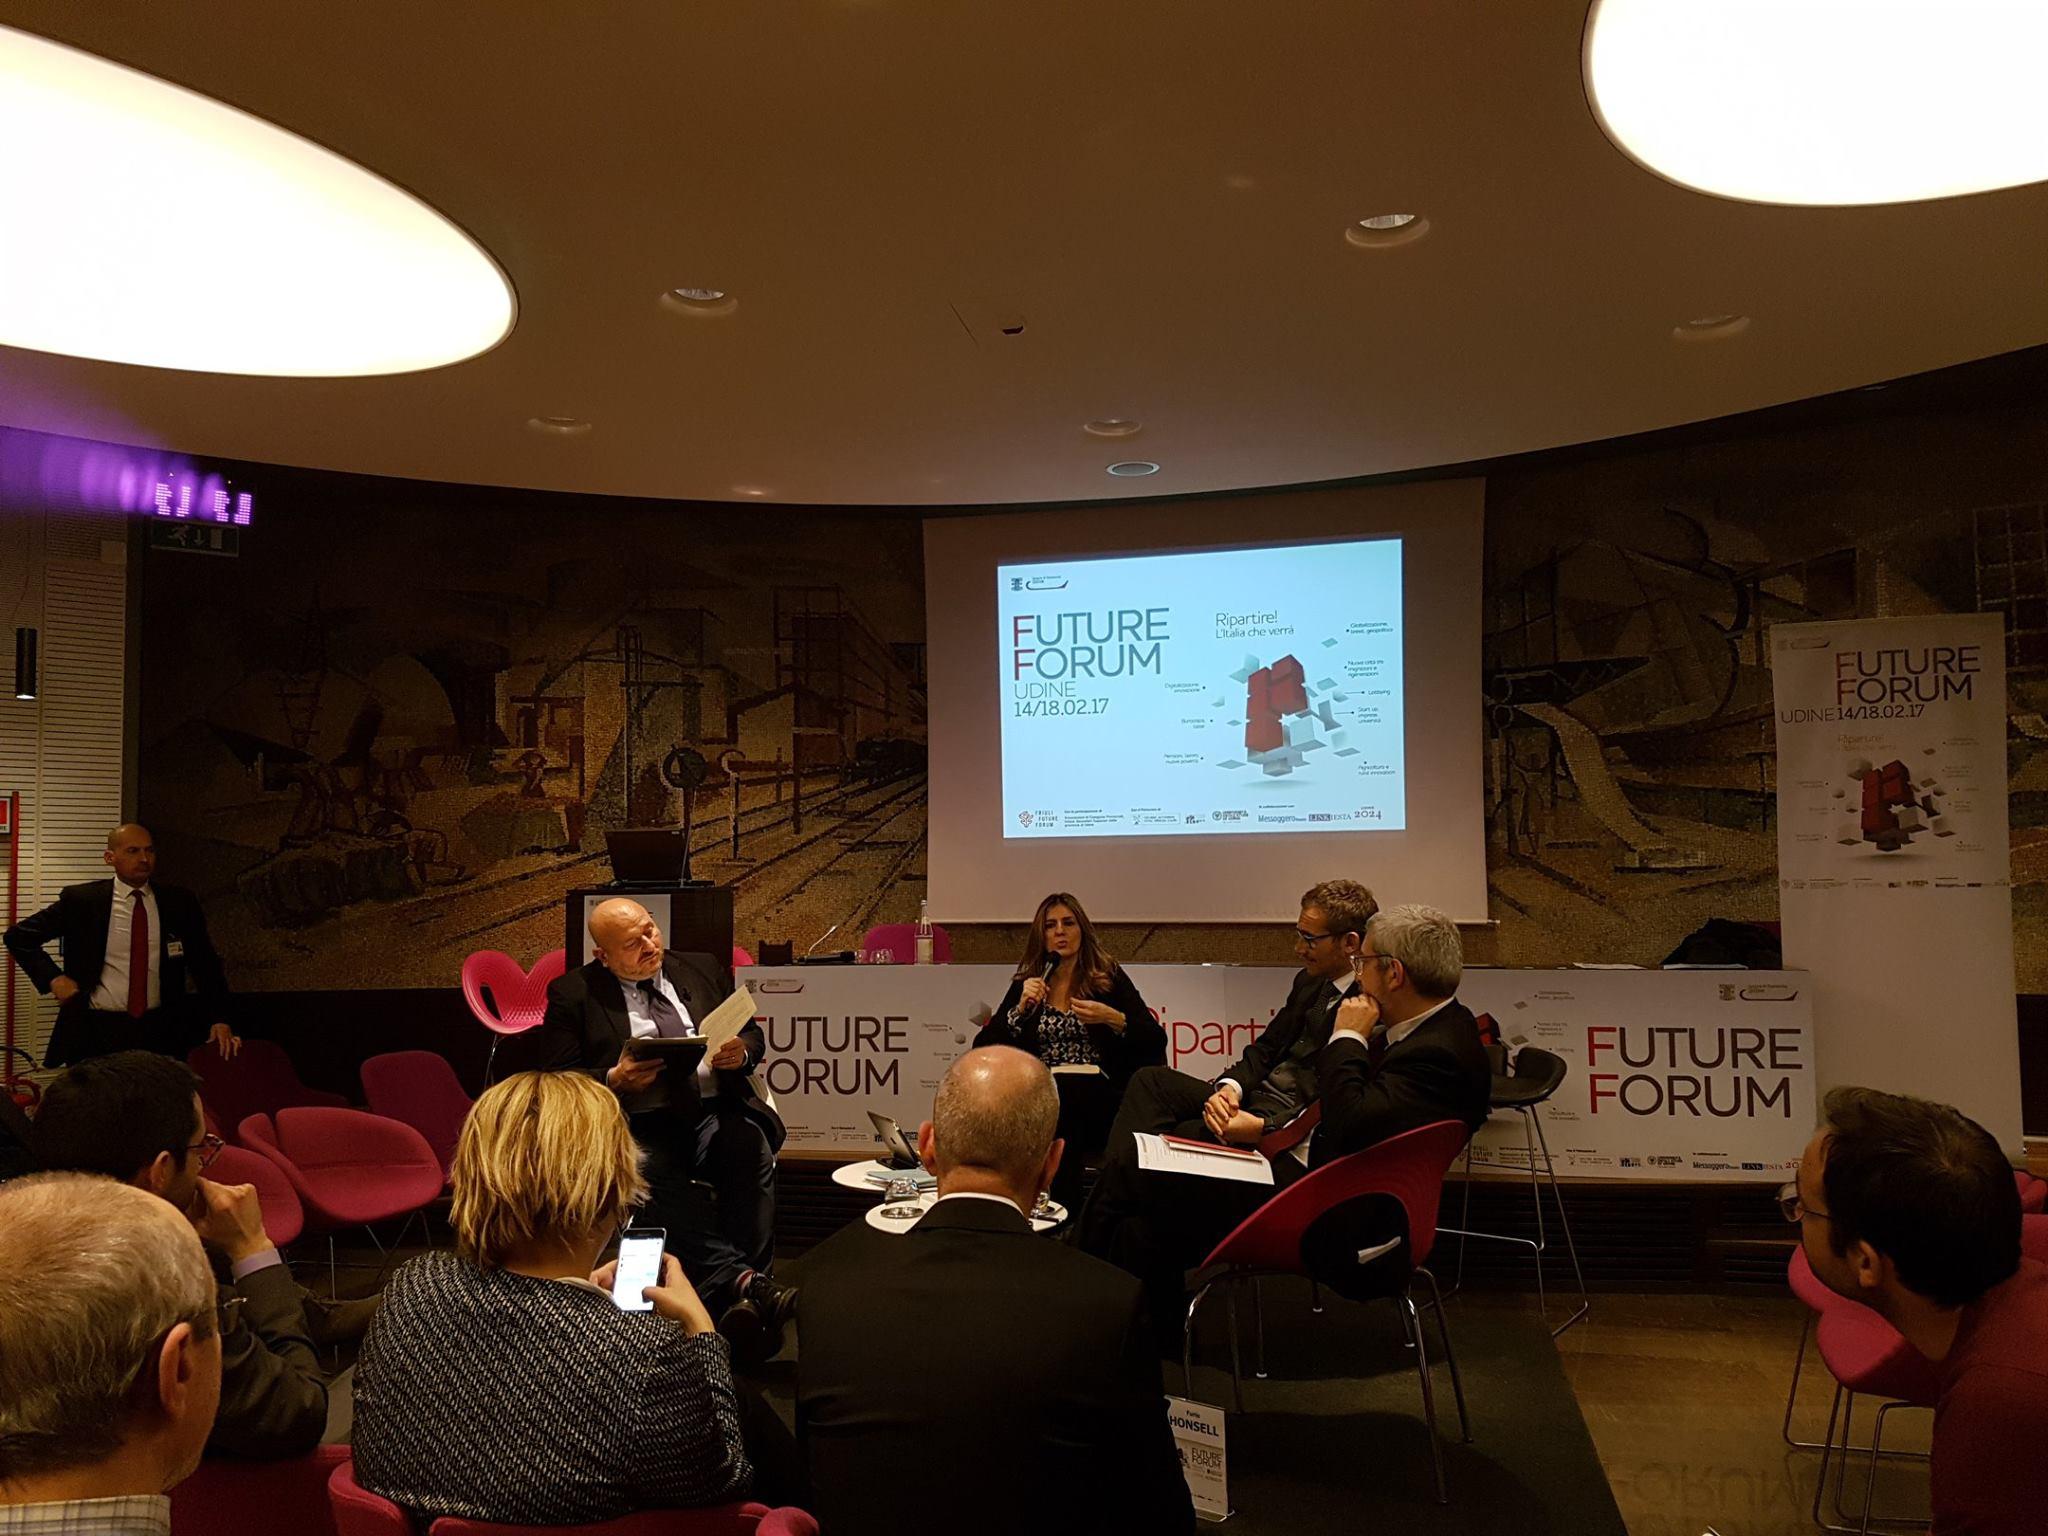 Future Forum /6 Burocrazia: bestia nera o necessità?